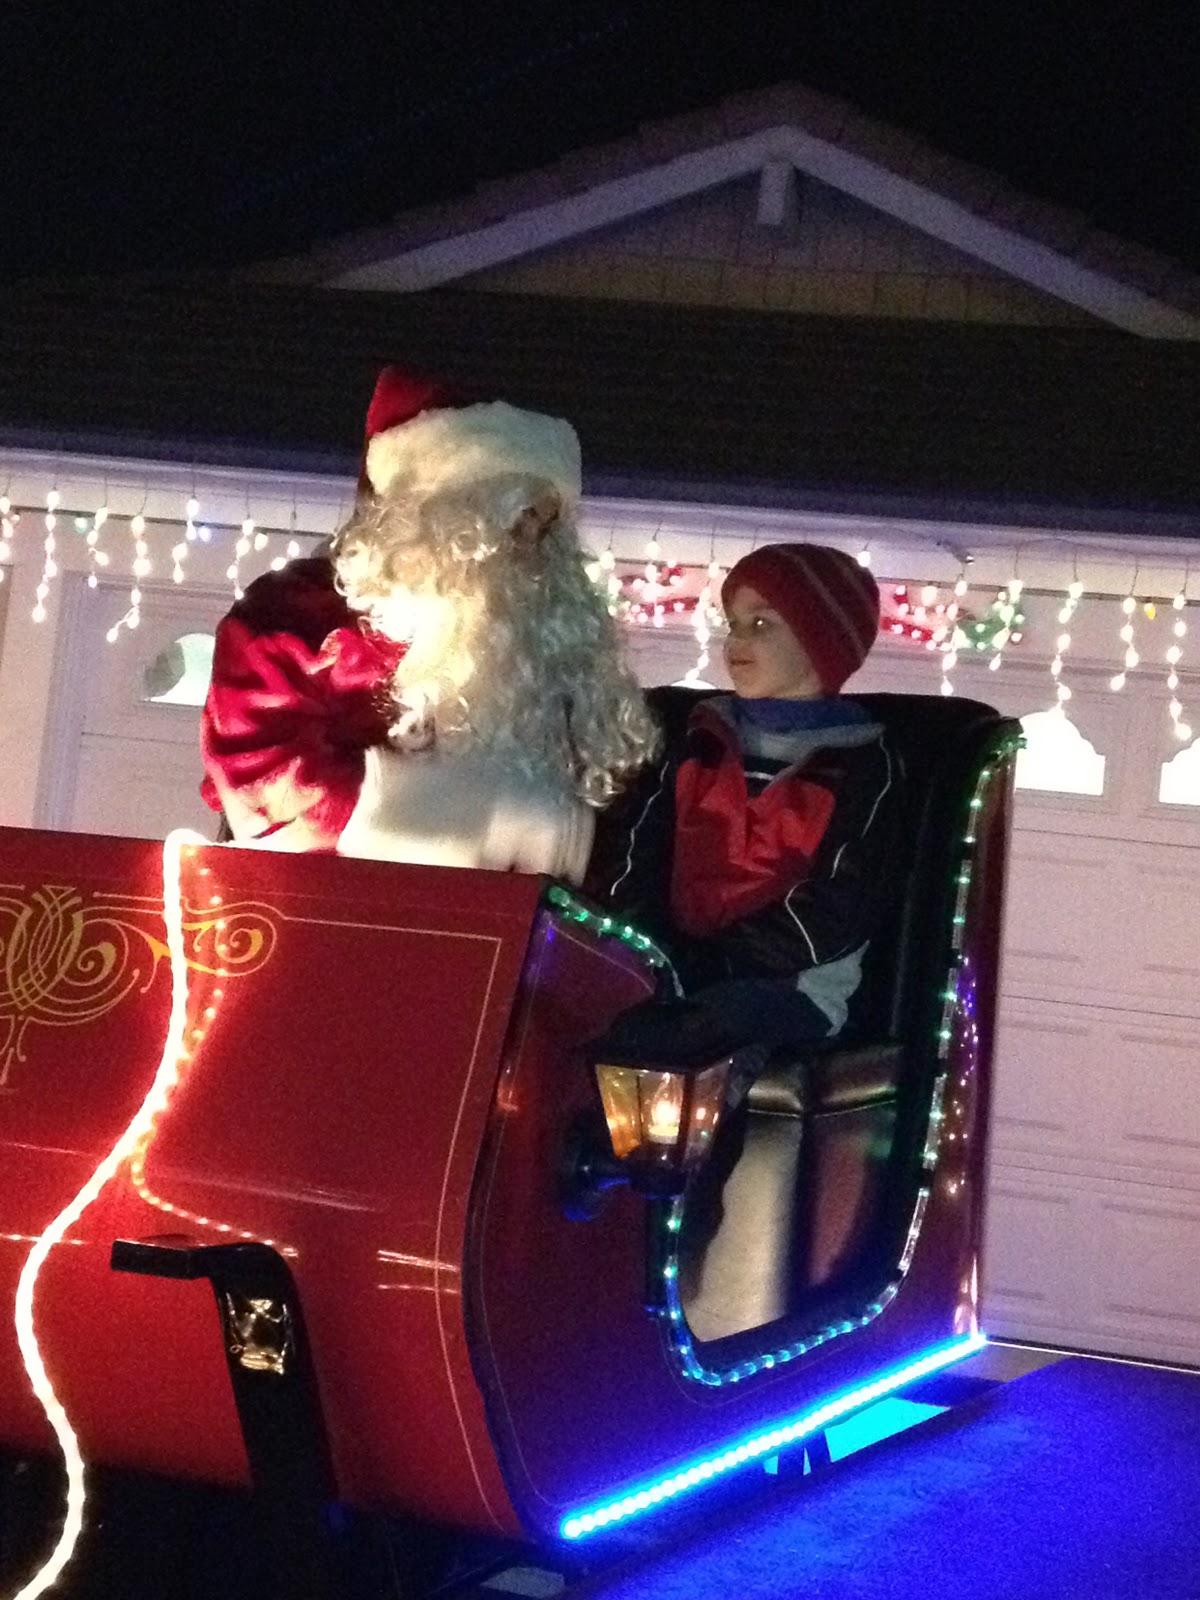 Brea Christmas Lights.Eagle Hill Christmas Lights In Brea California